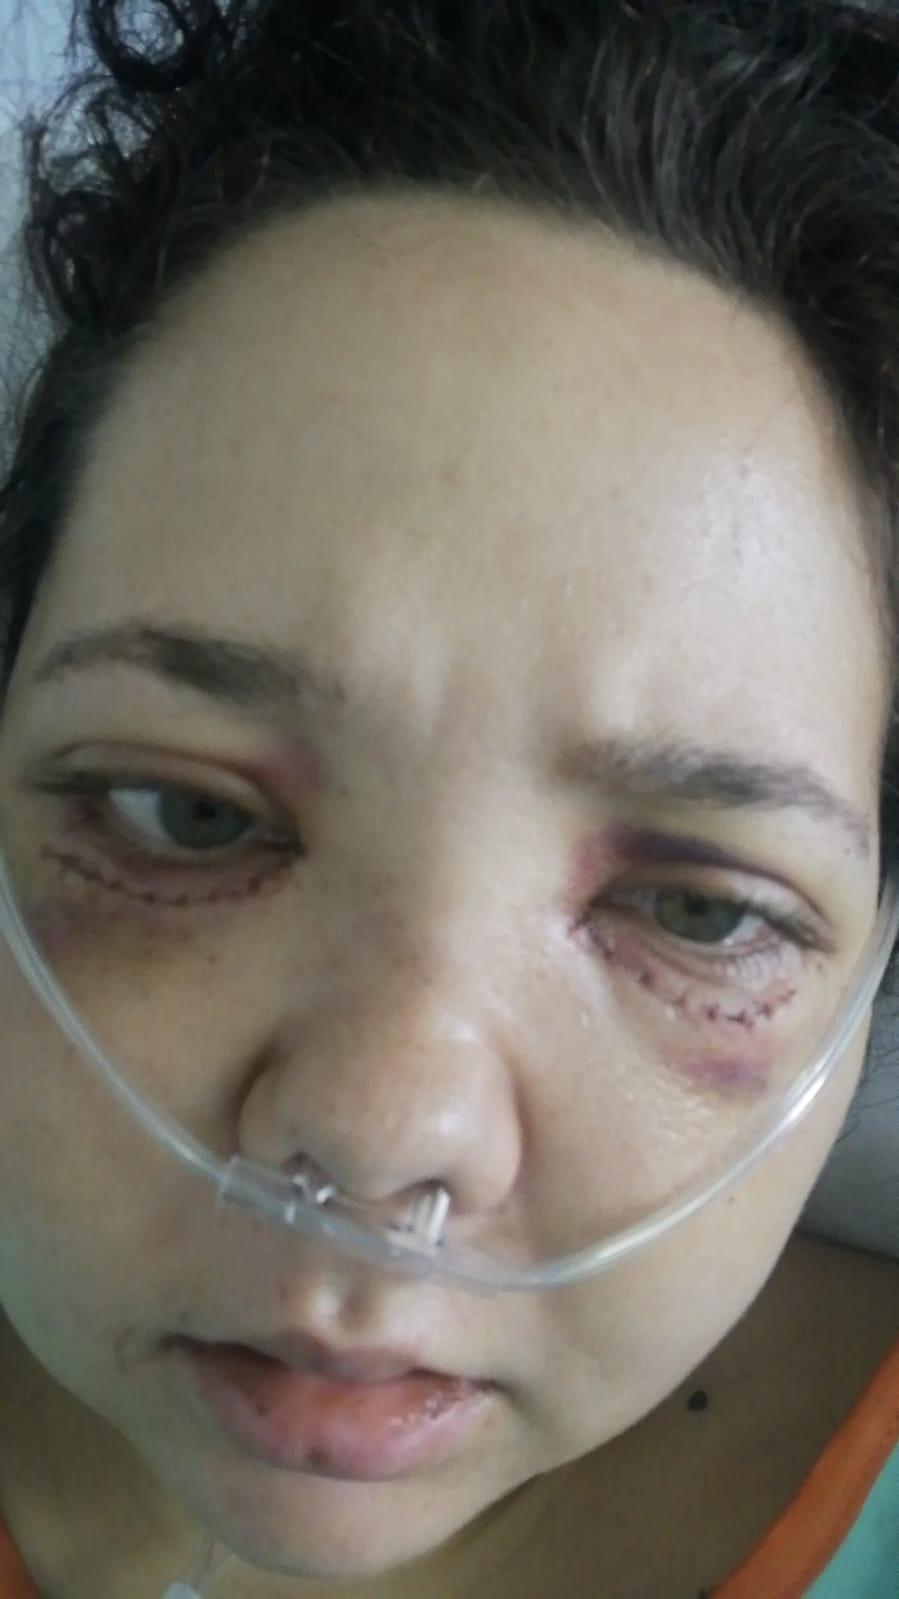 Monique Hepburn na haar operasie. Foto: Verskaf